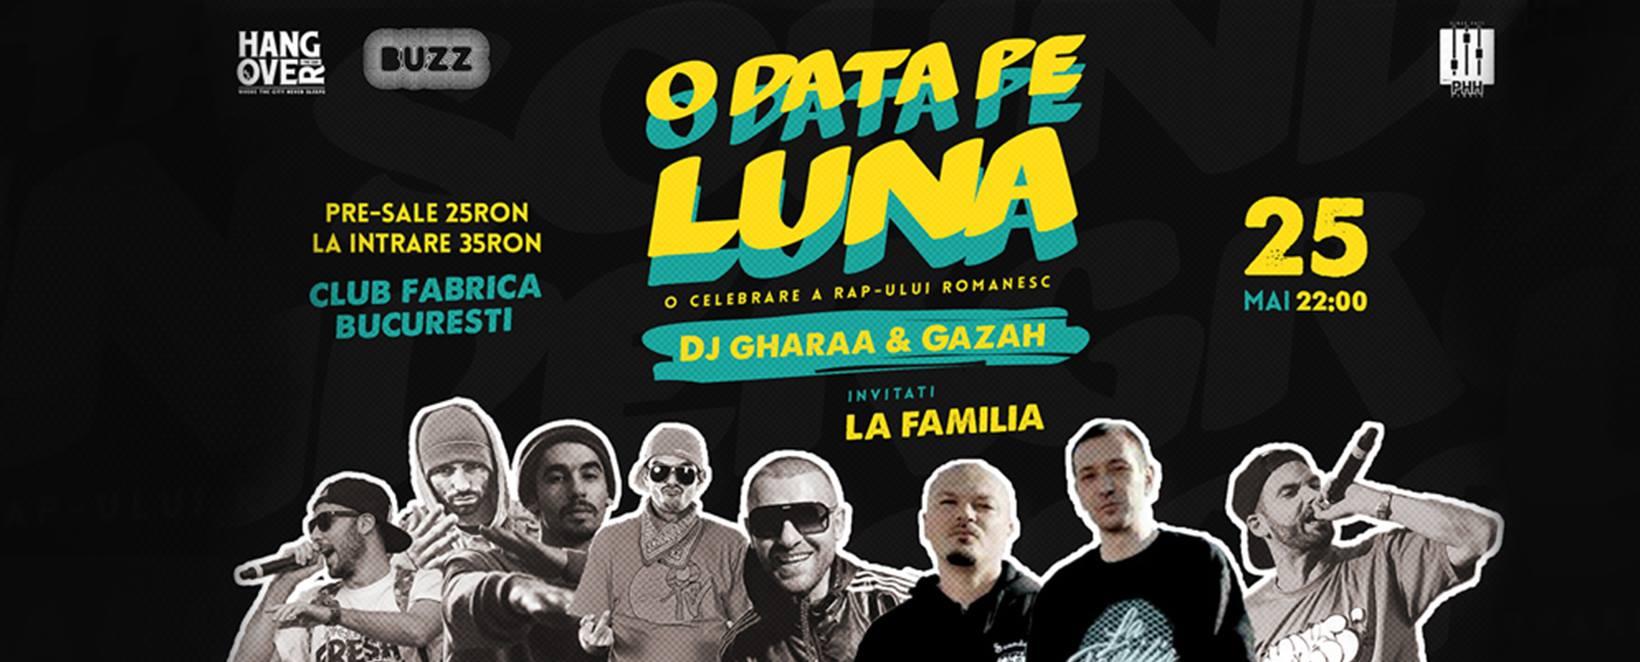 O Data Pe Luna w La Familia, gAZAh & DJ Gharaa